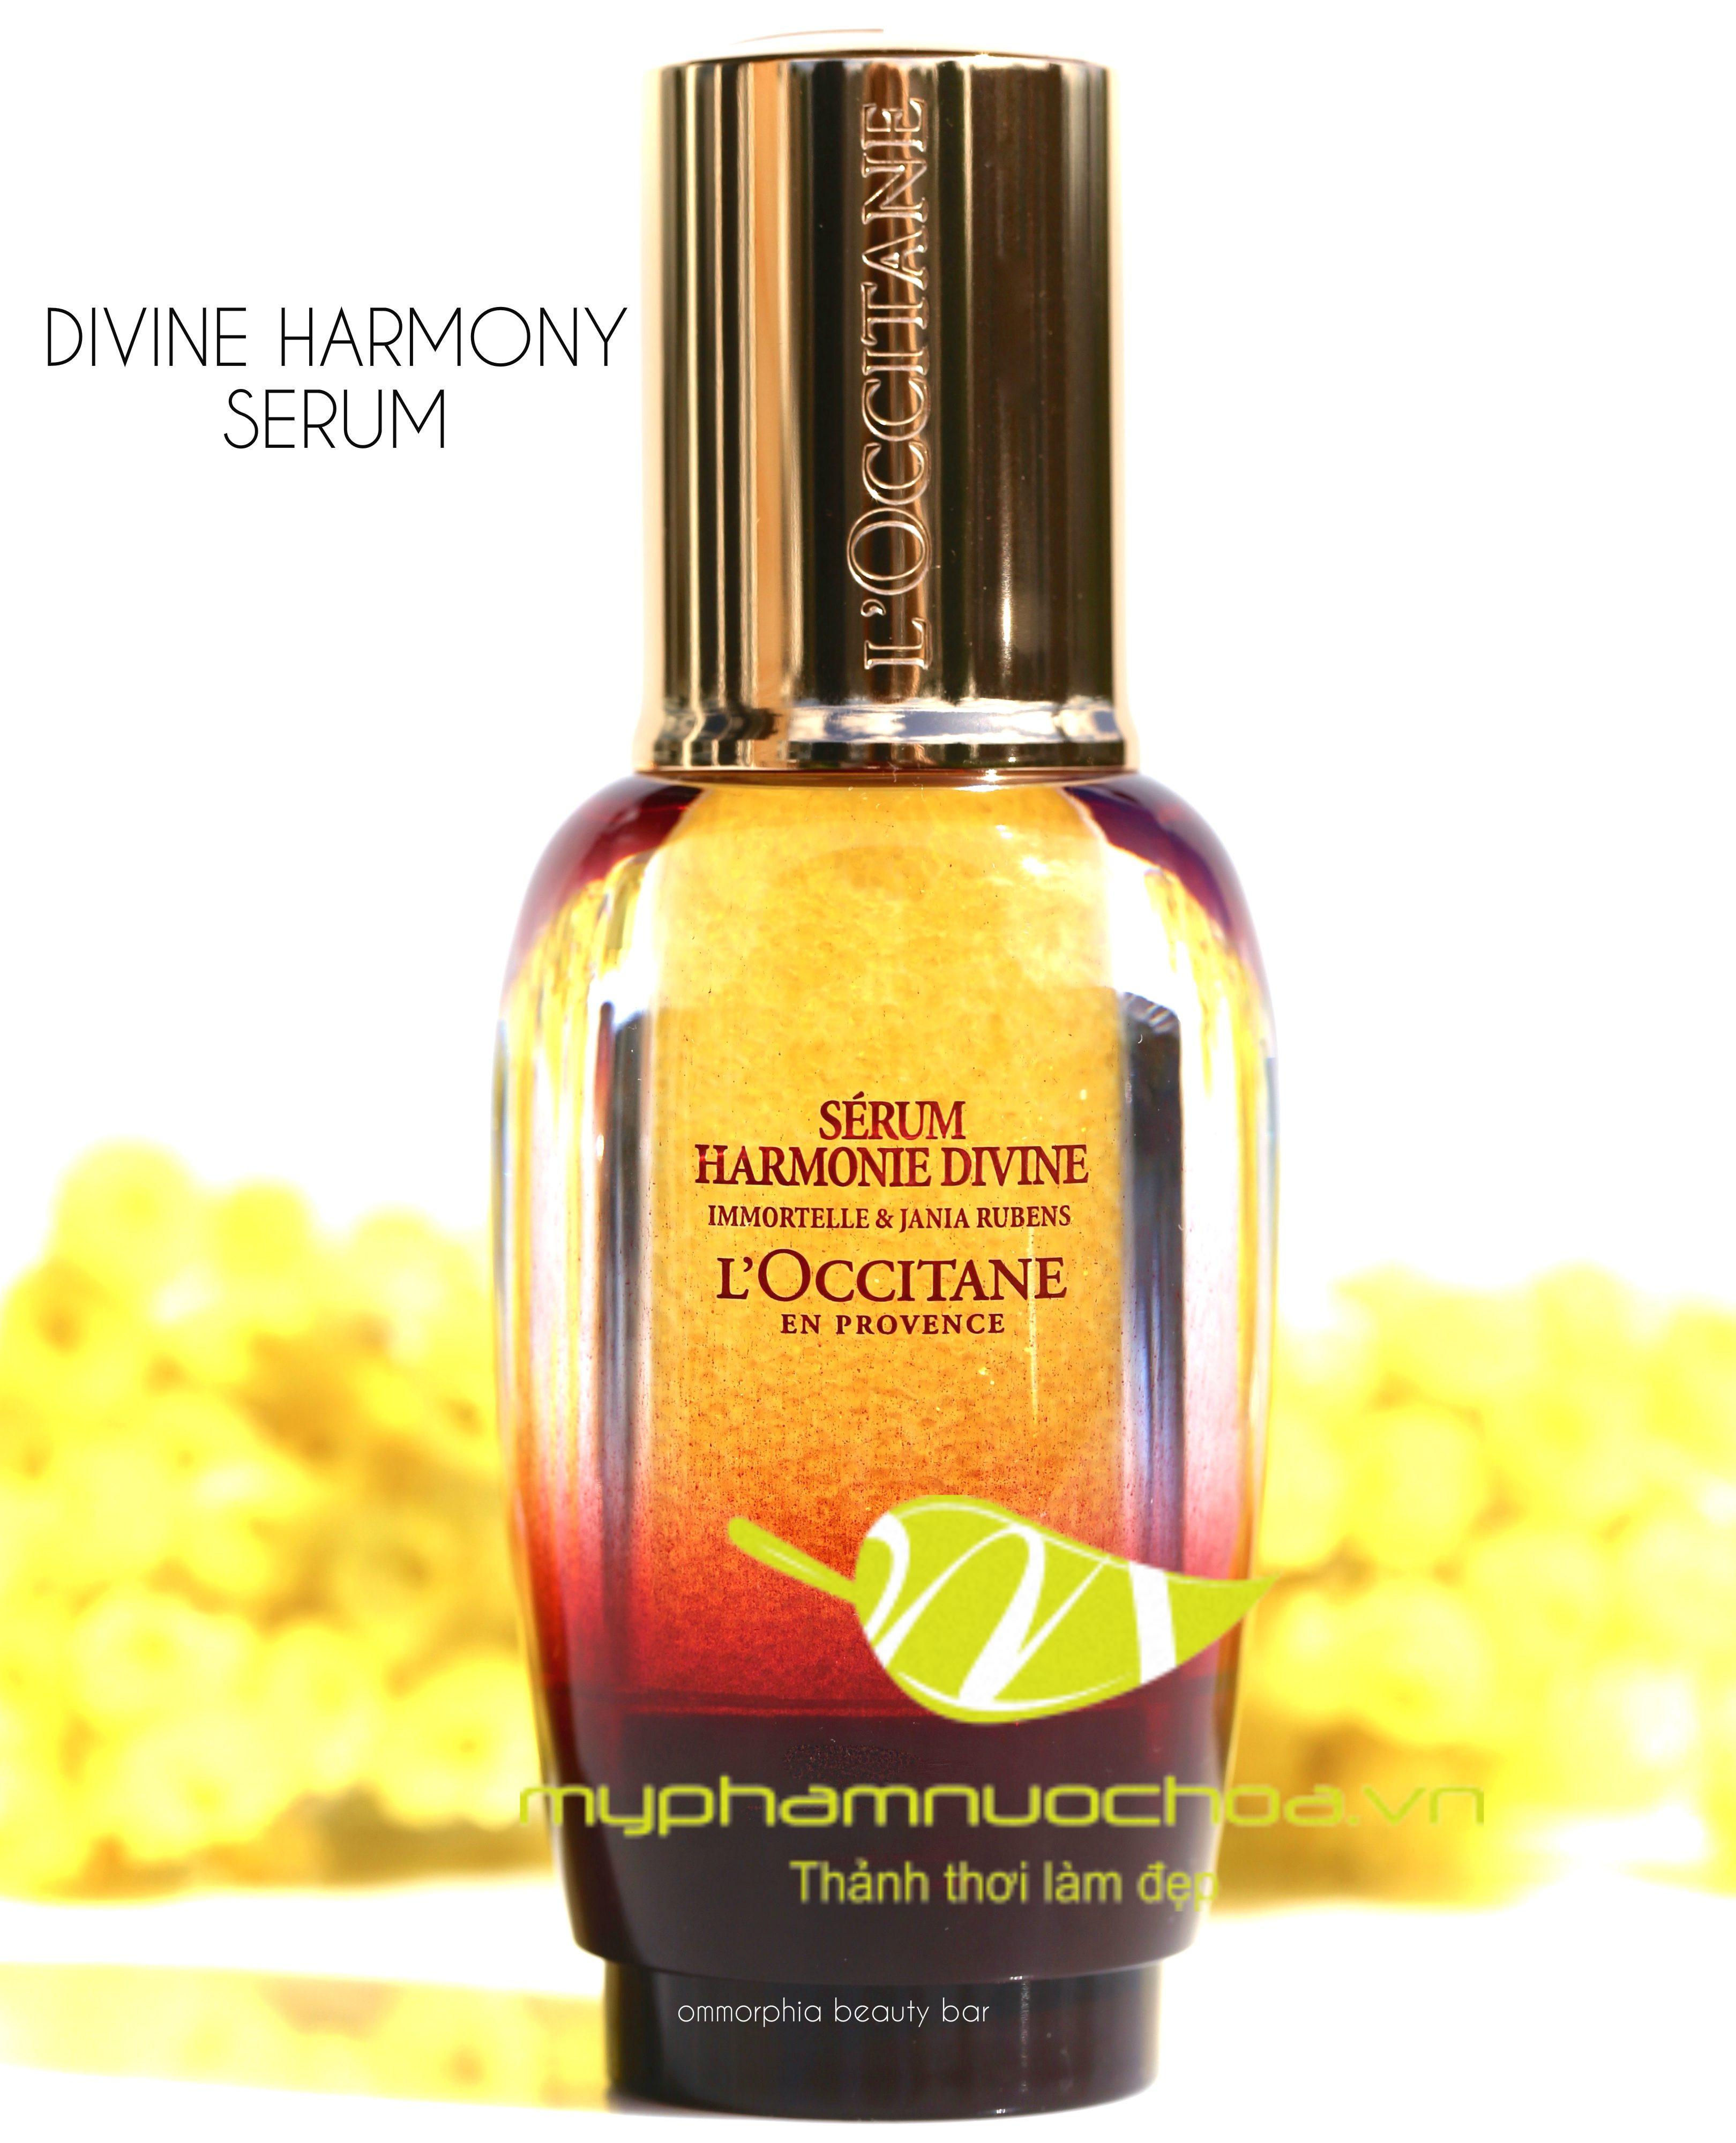 Tinh chất trẻ hóa da quyền năng Loccitane Divine Harmony